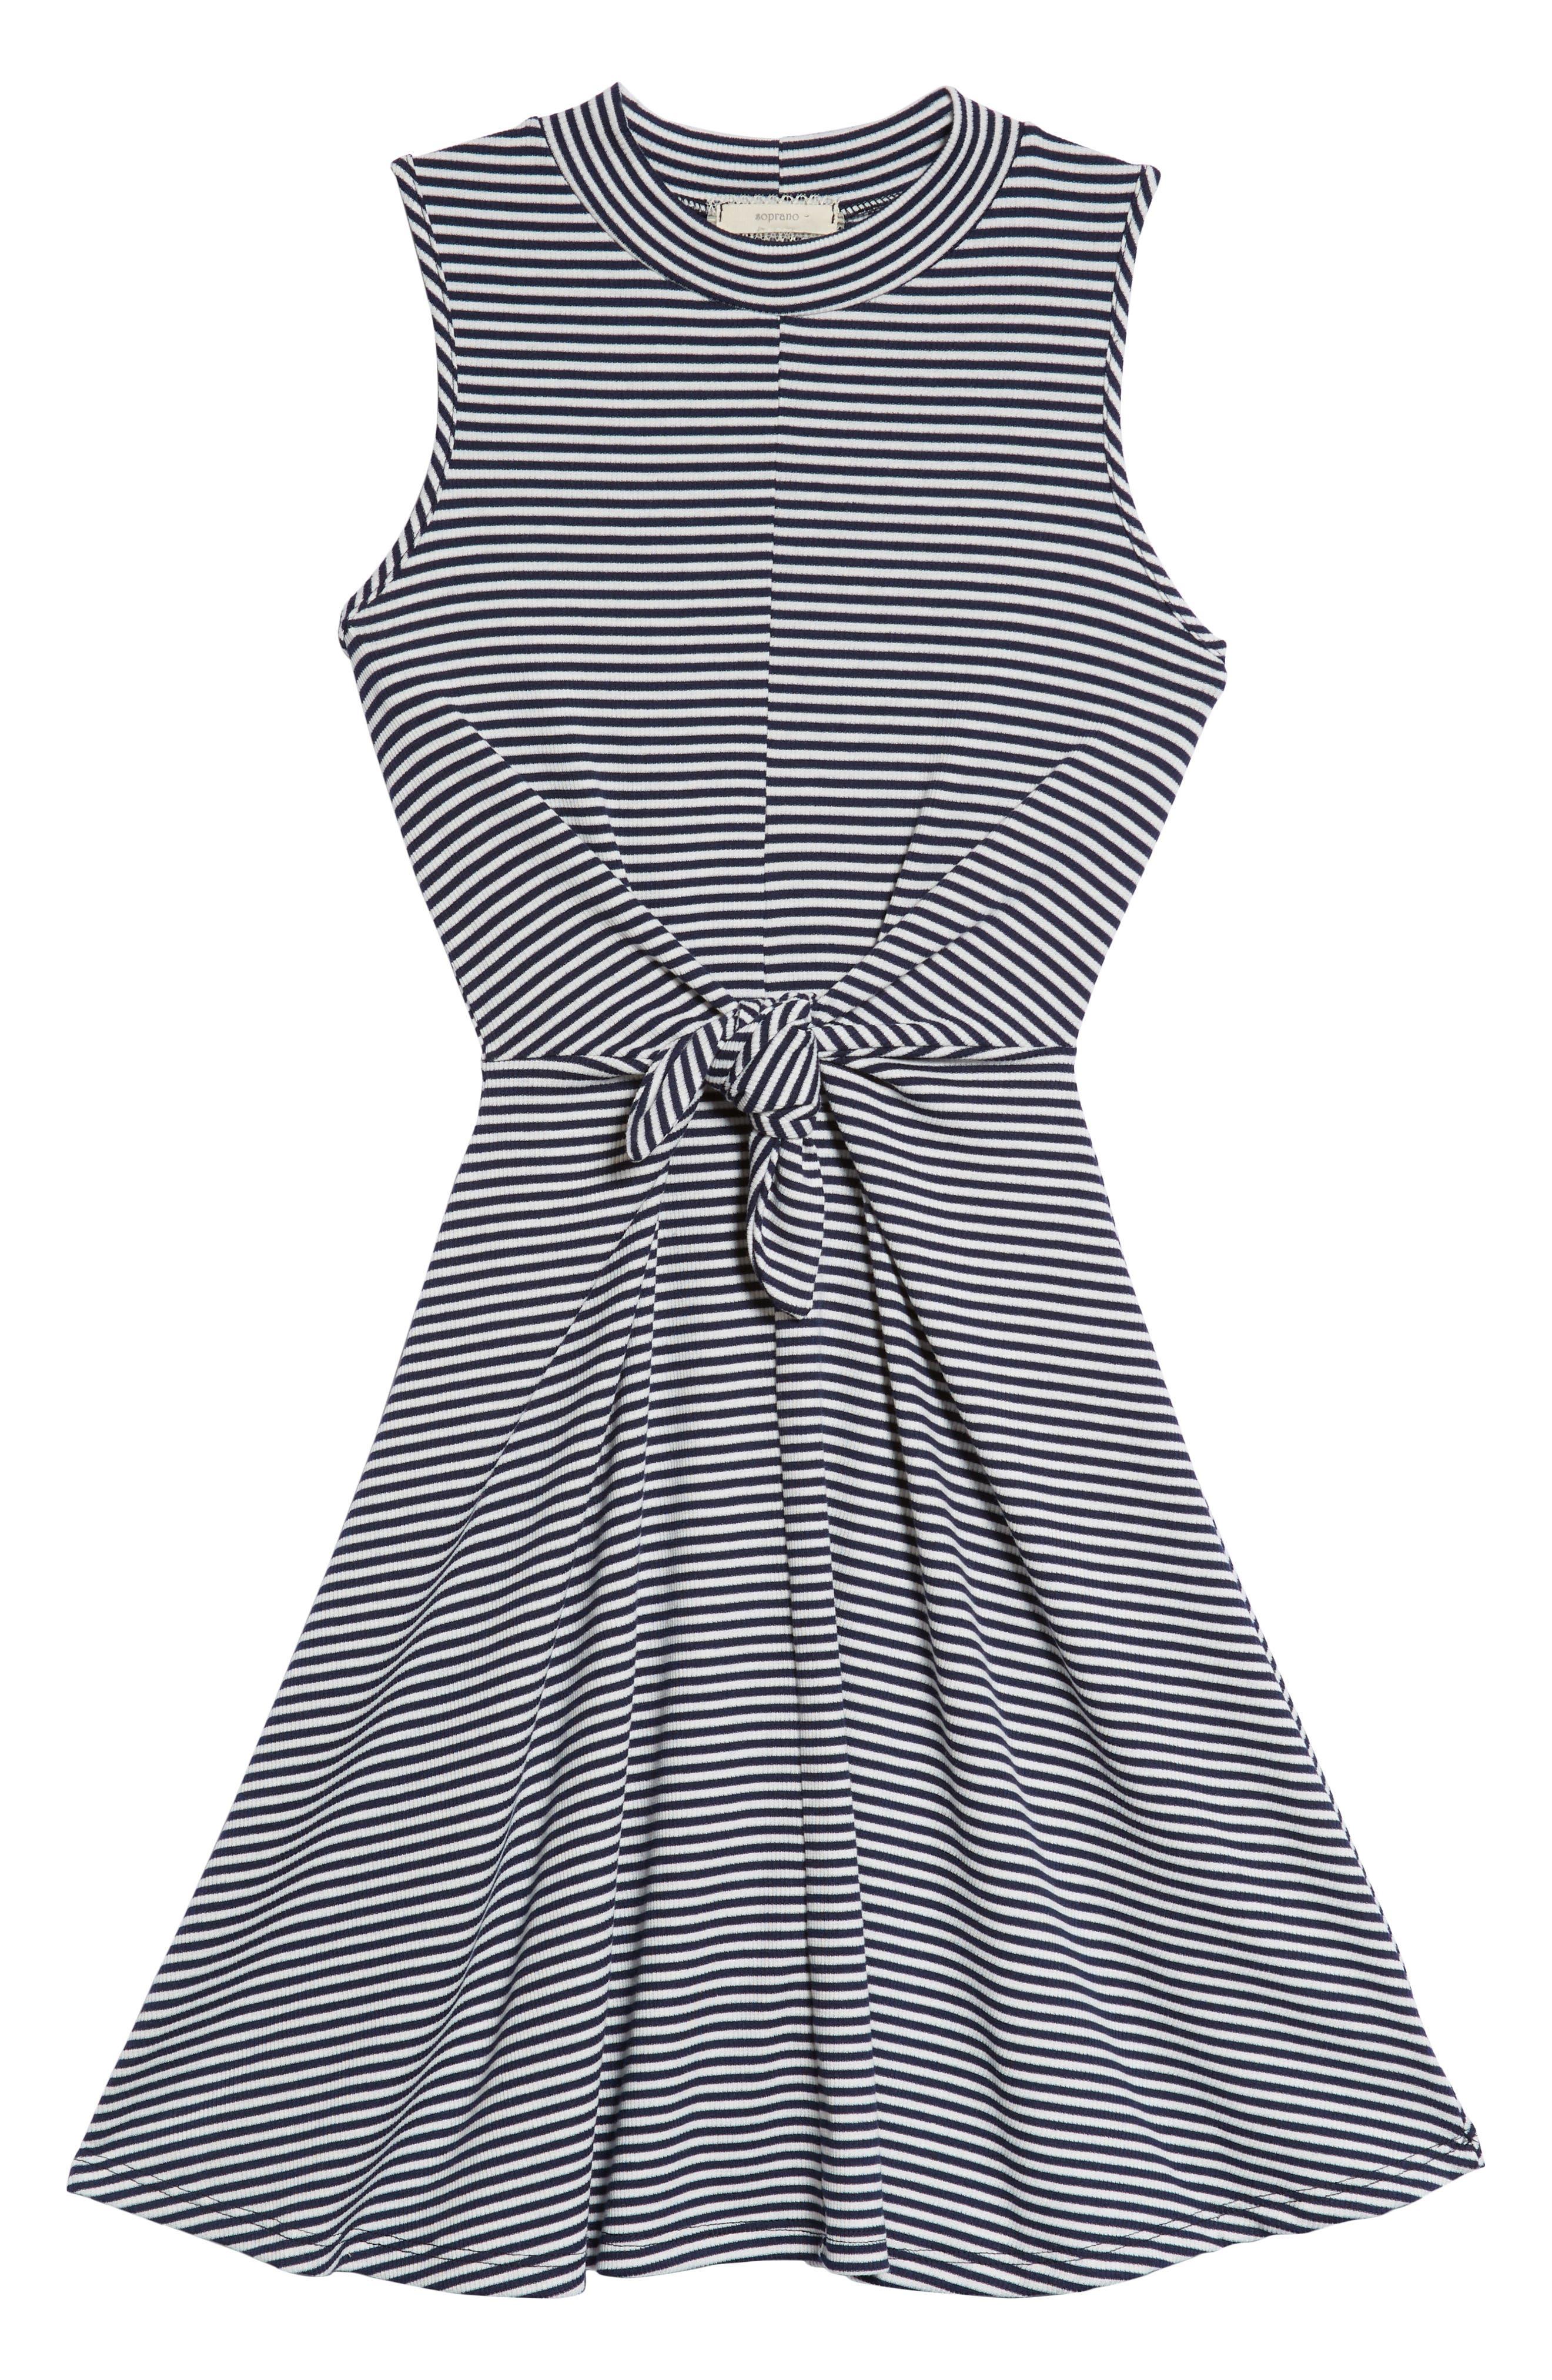 Tie Front Skater Dress,                             Main thumbnail 1, color,                             410